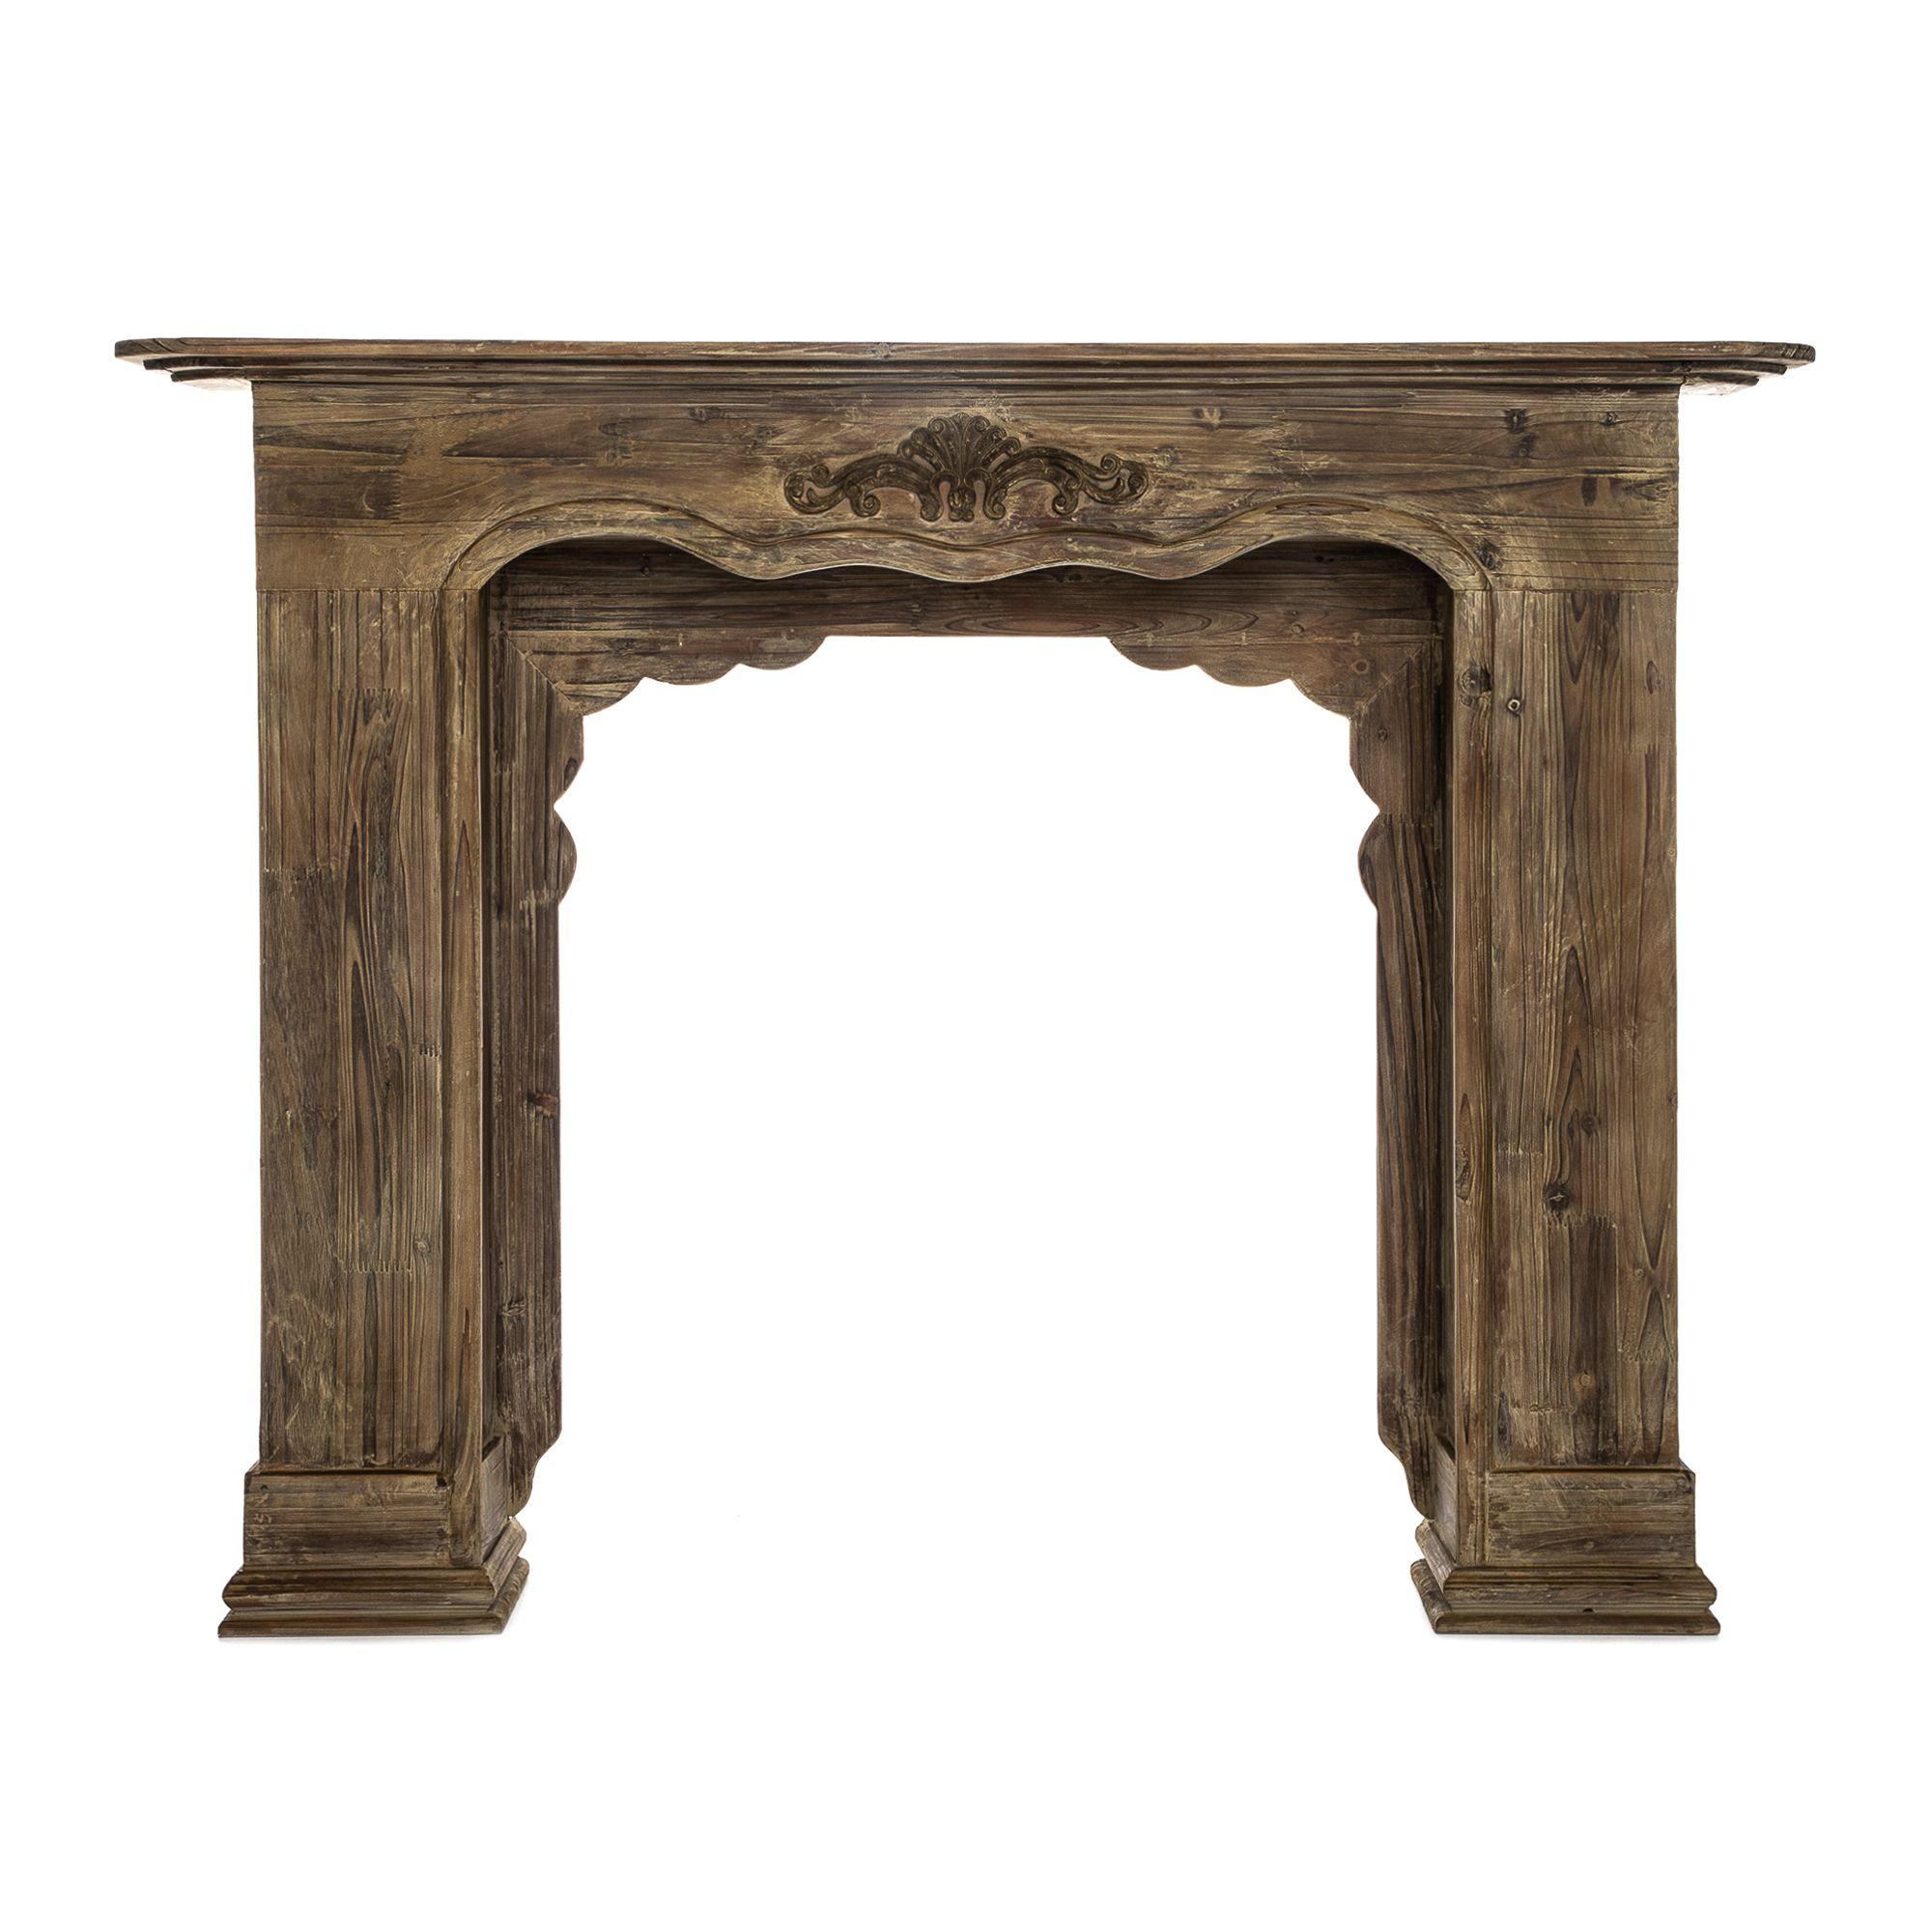 My Home Stories Holz Kaminkonsole Lasiert Ca 130x23x100cm Qvc De